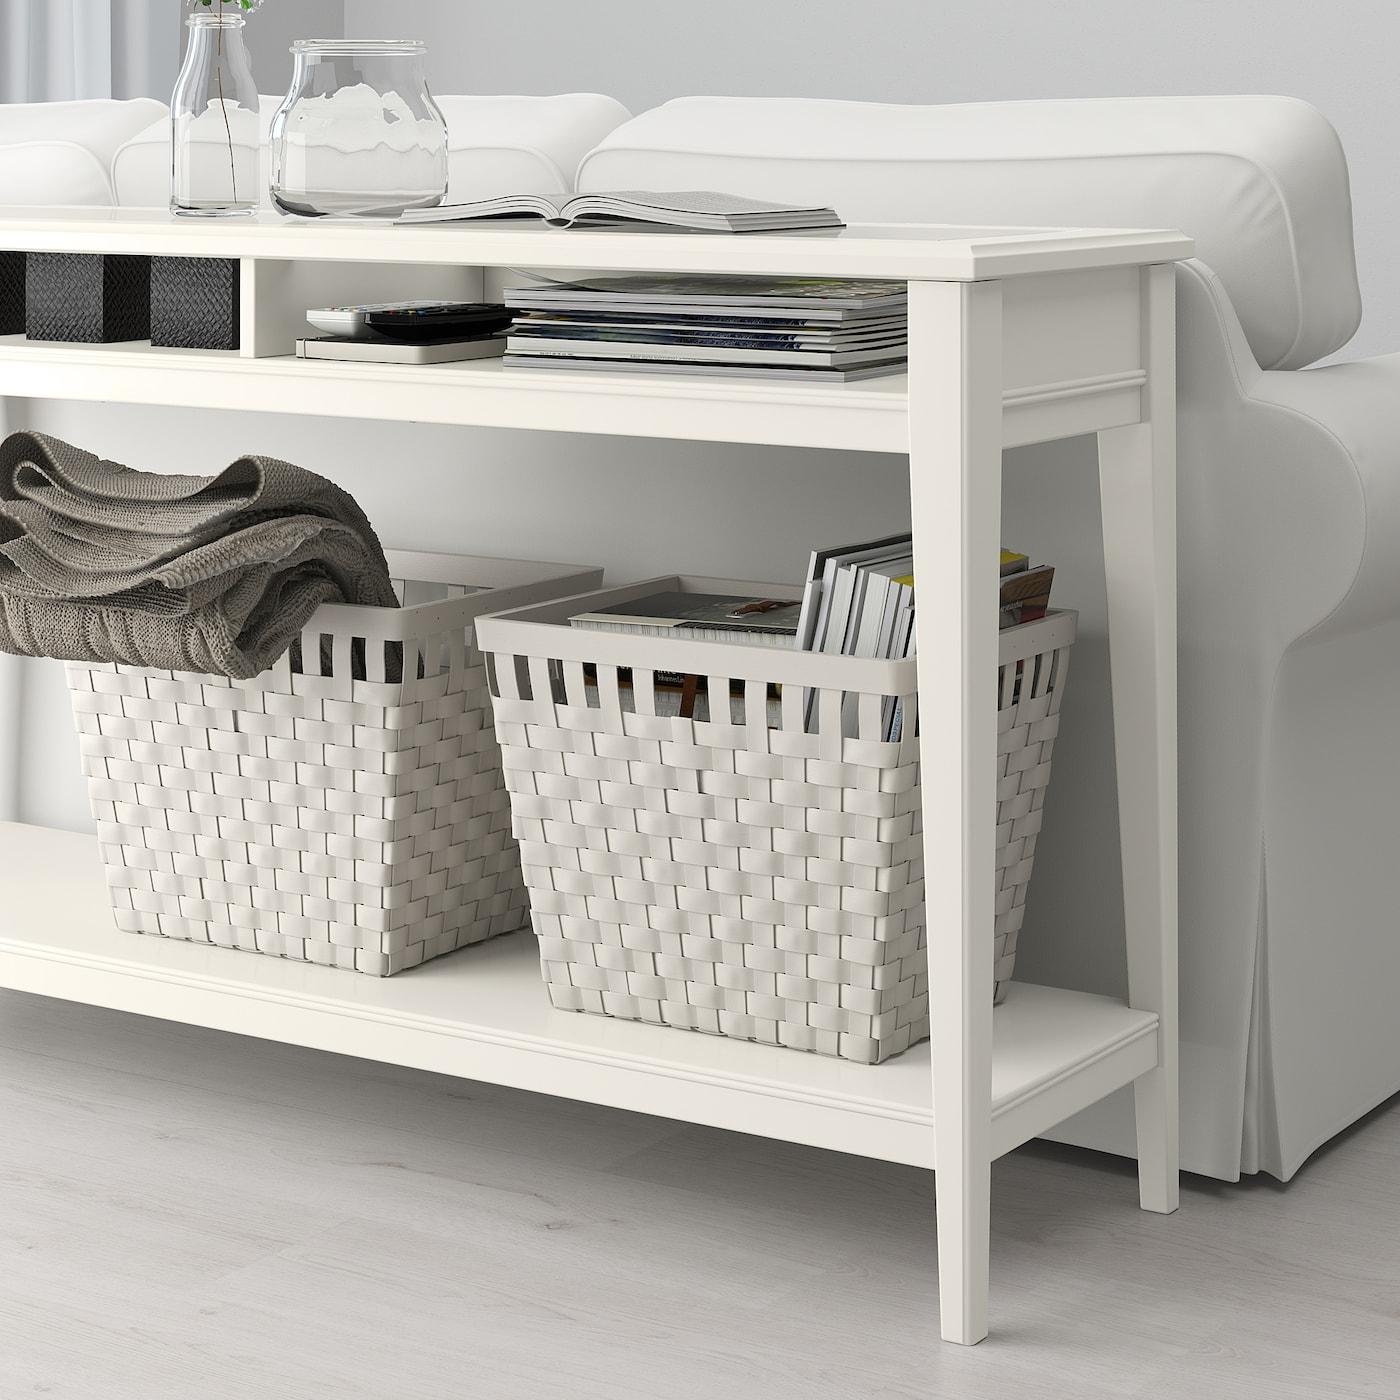 LIATORP Avlastningsbord, vit, glas, 133x37 cm IKEA